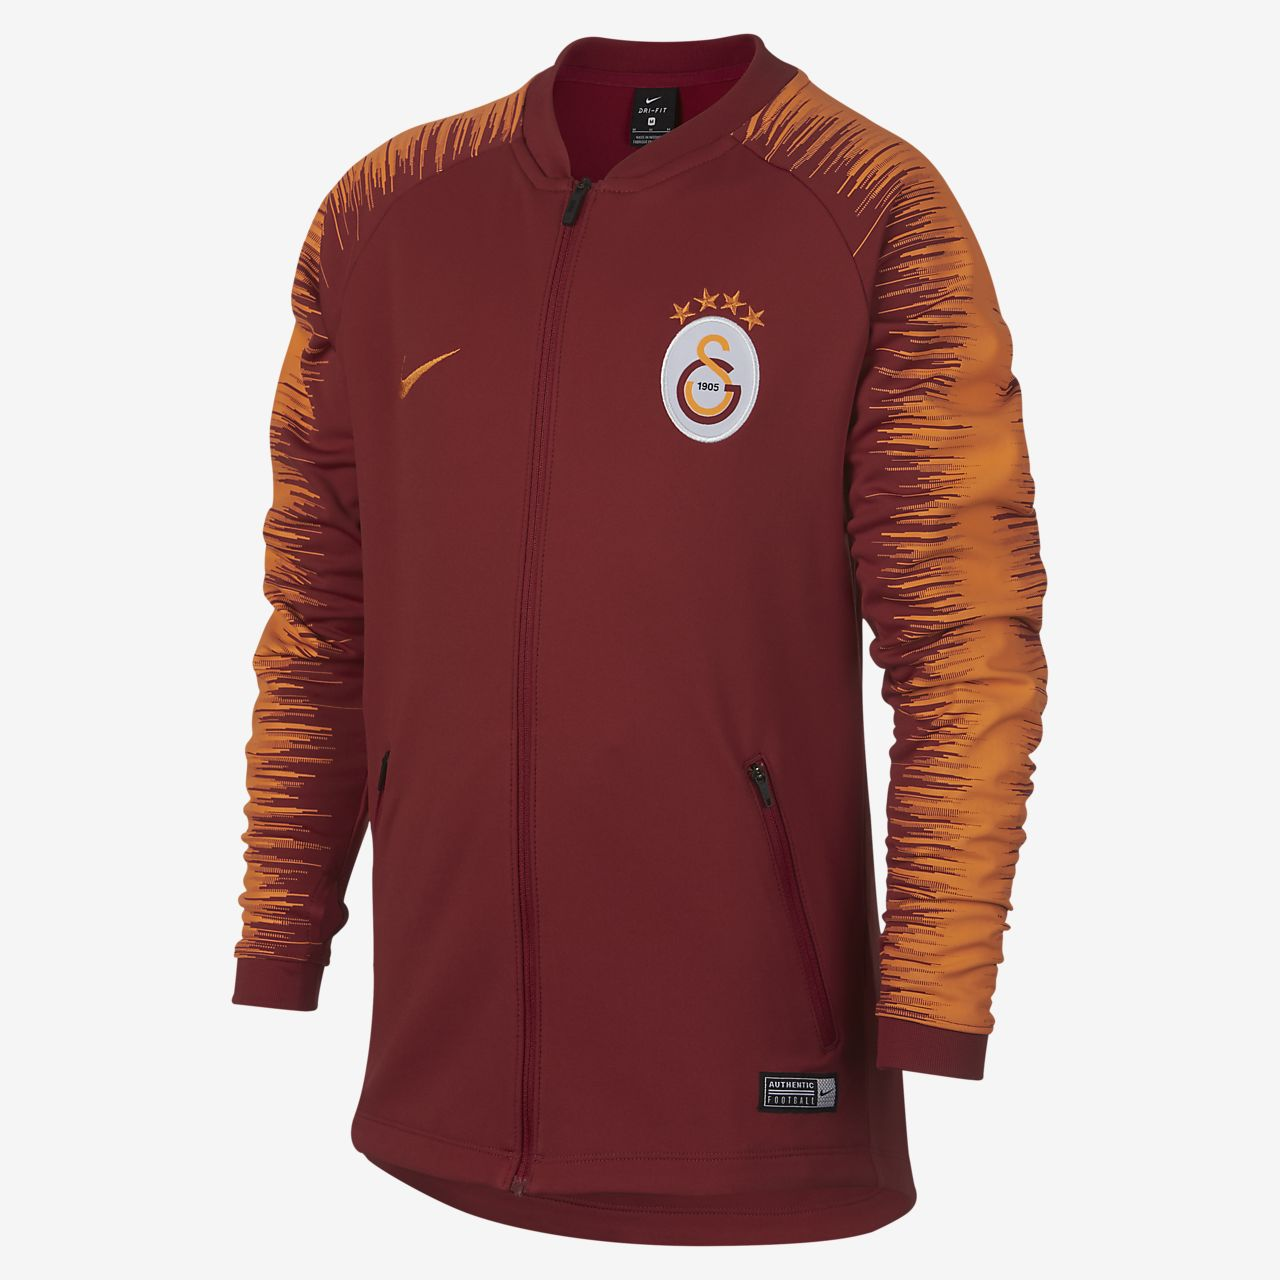 Galatasaray S.K. Anthem Chaqueta de fútbol - Niño a. Nike.com ES 7f7c6152353ed